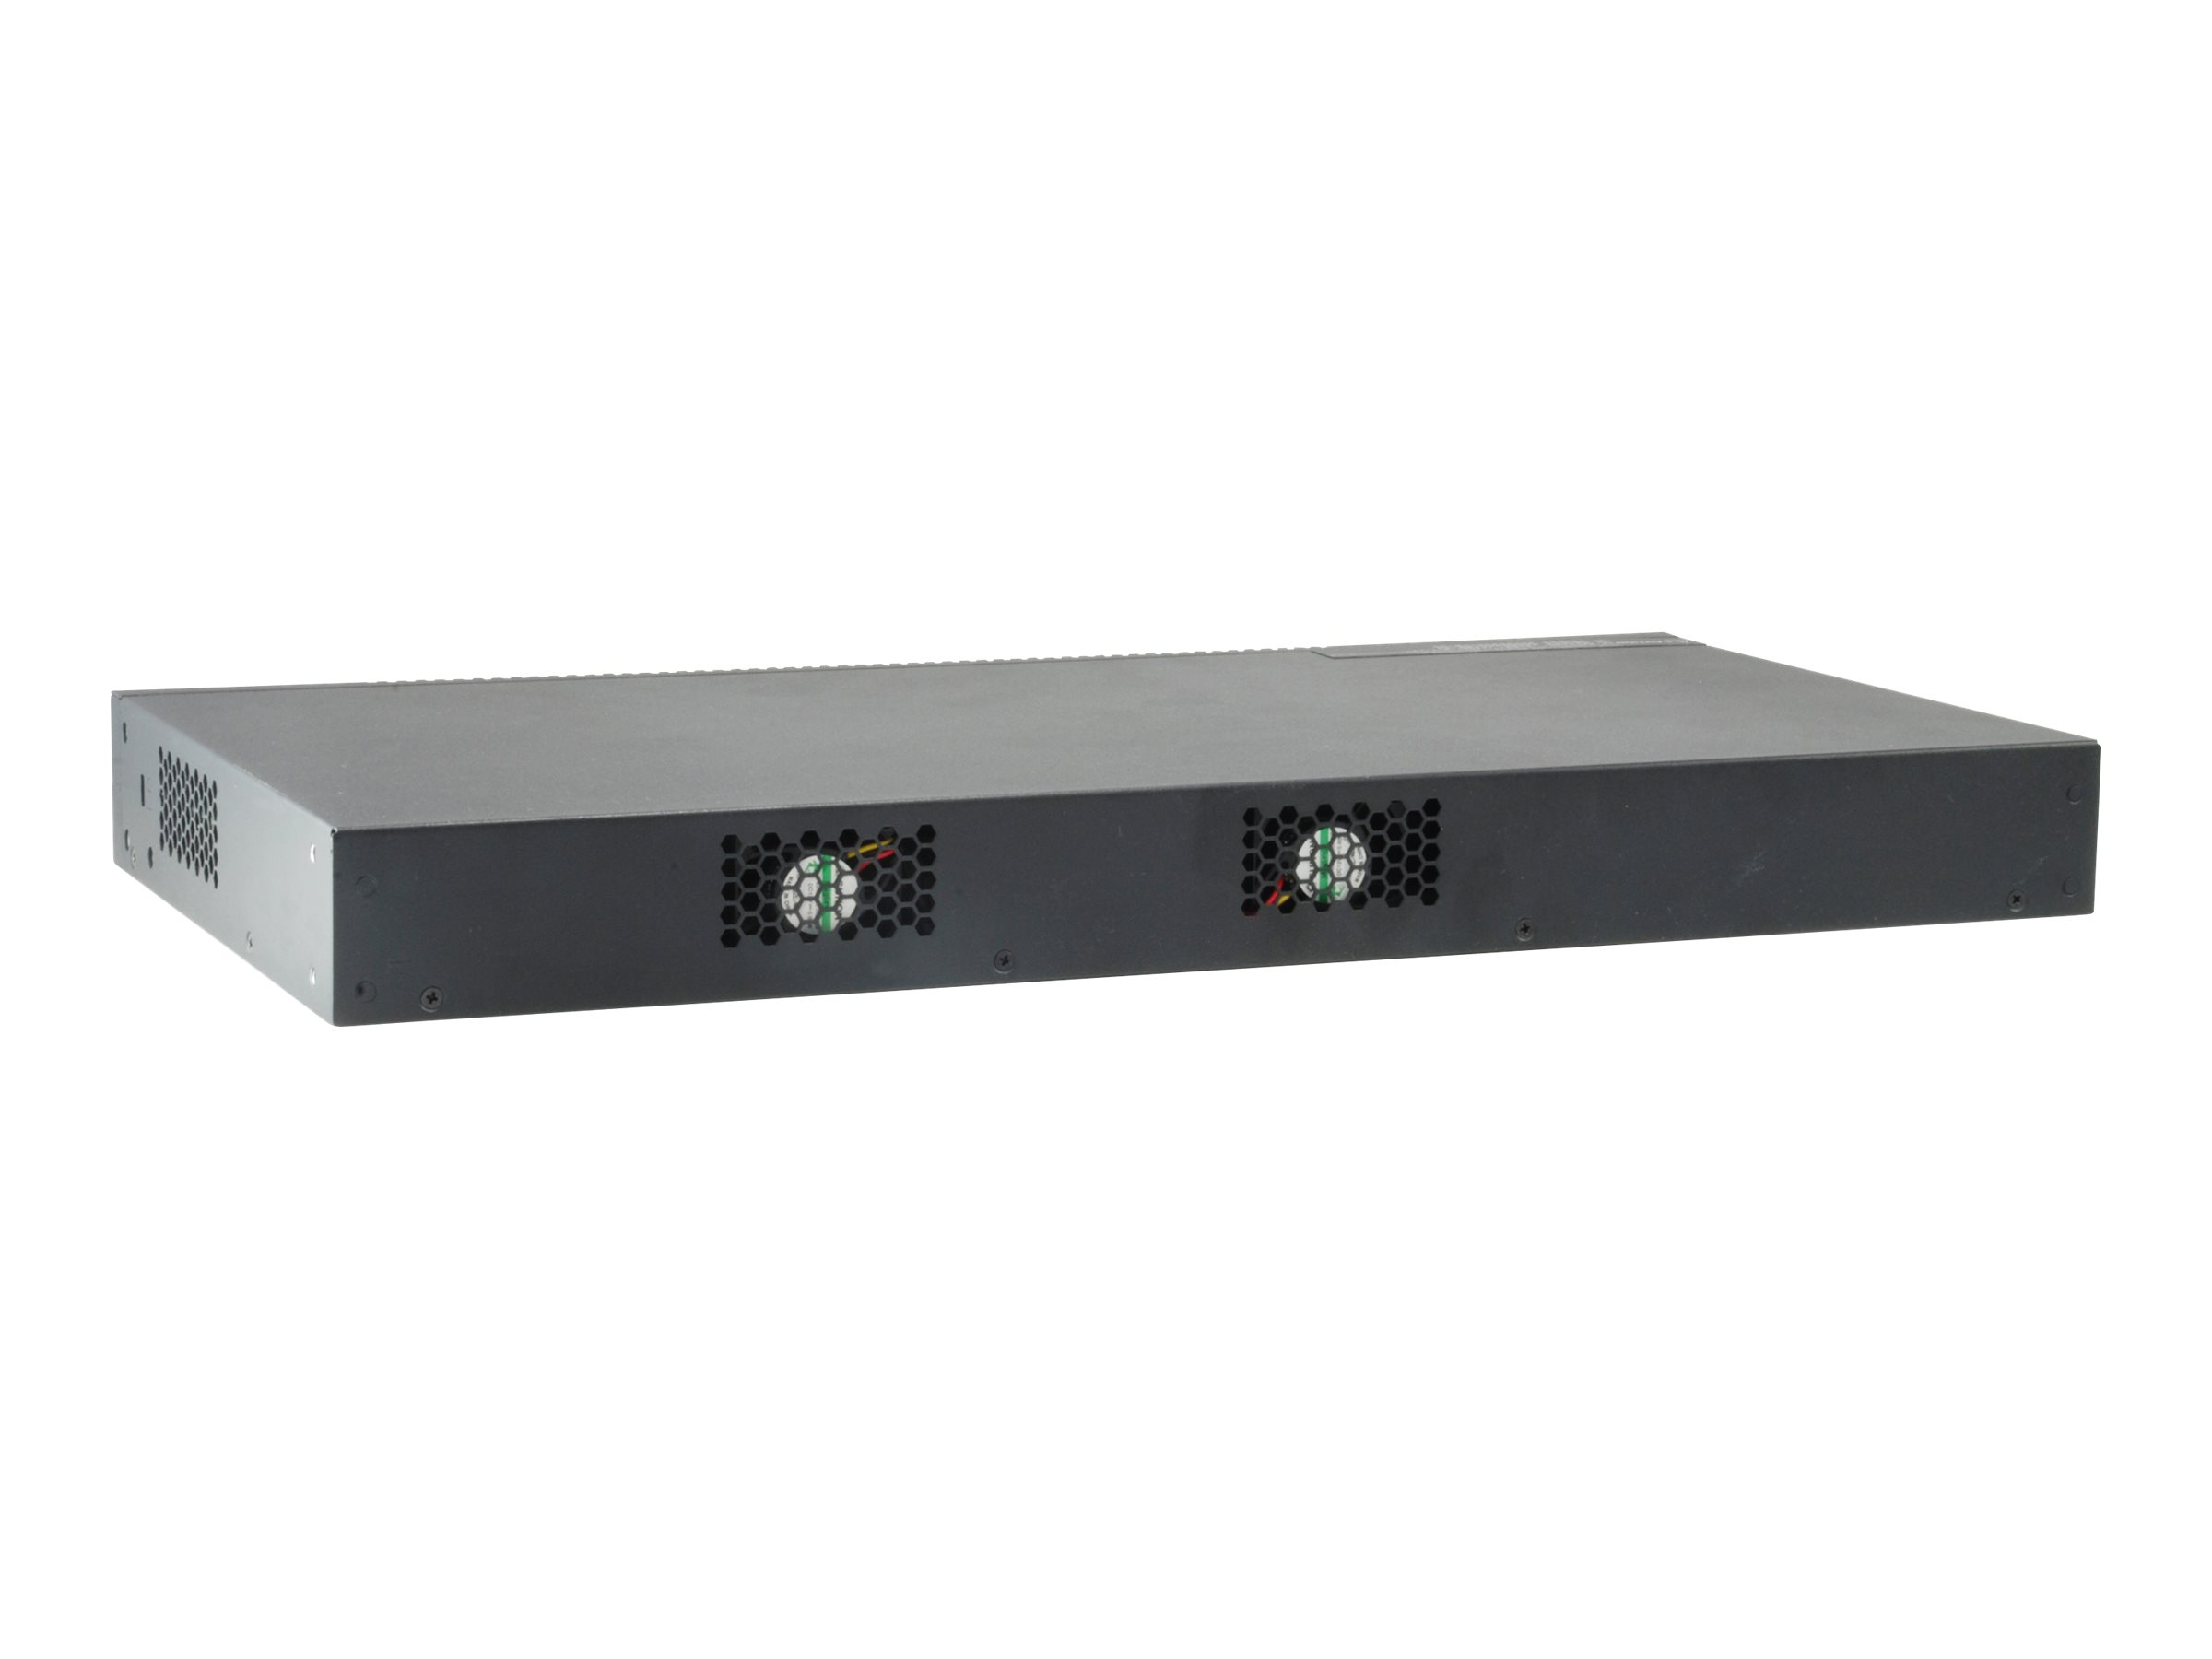 LevelOne KILBY GTL-2872 - switch - 28 ports - managed - rack-mountable